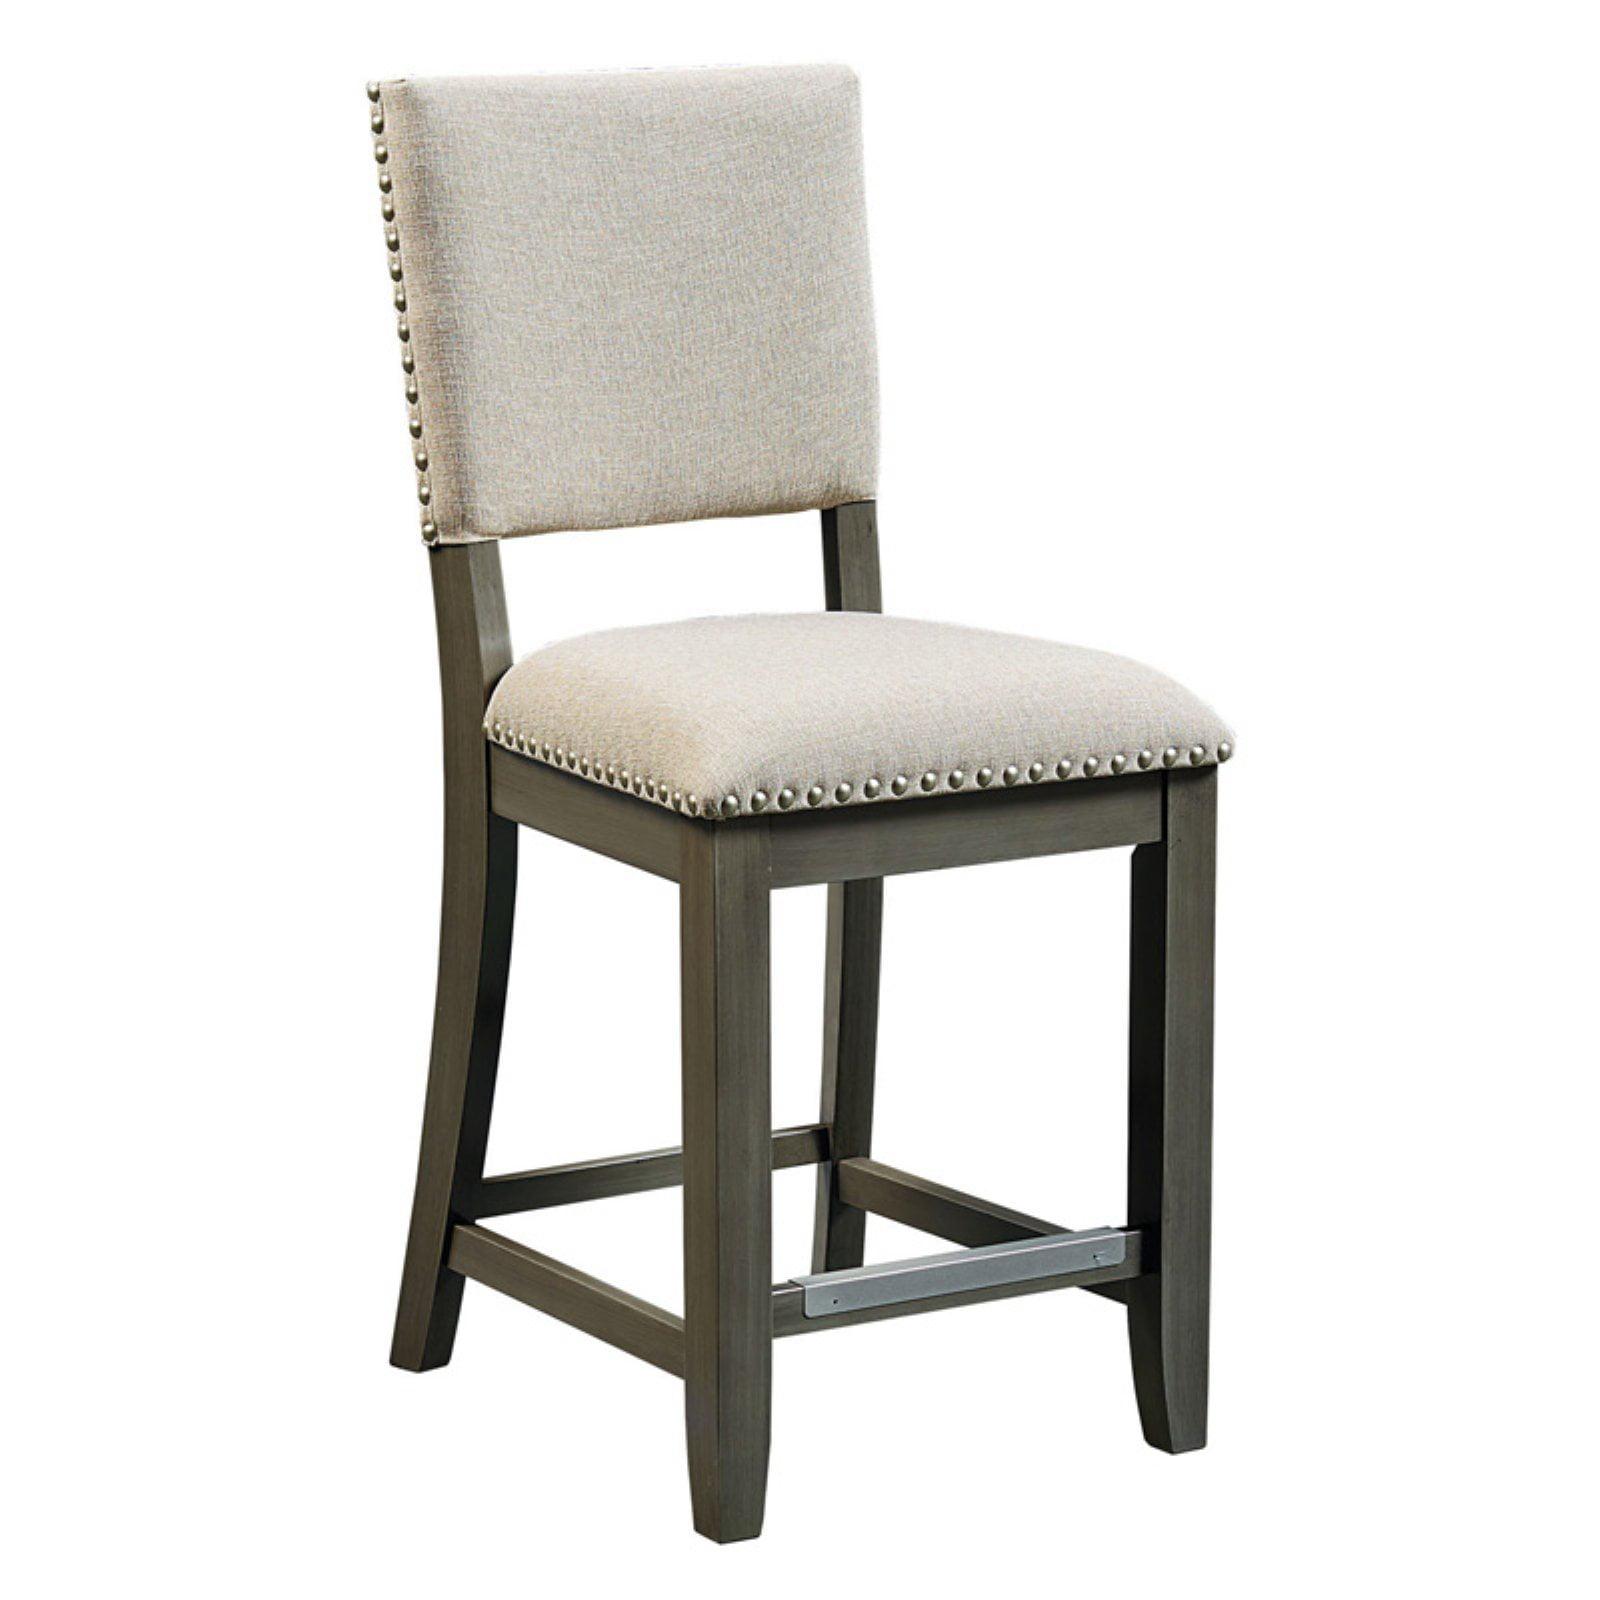 Standard Furniture Omaha Upholstered Stool - Set of 2